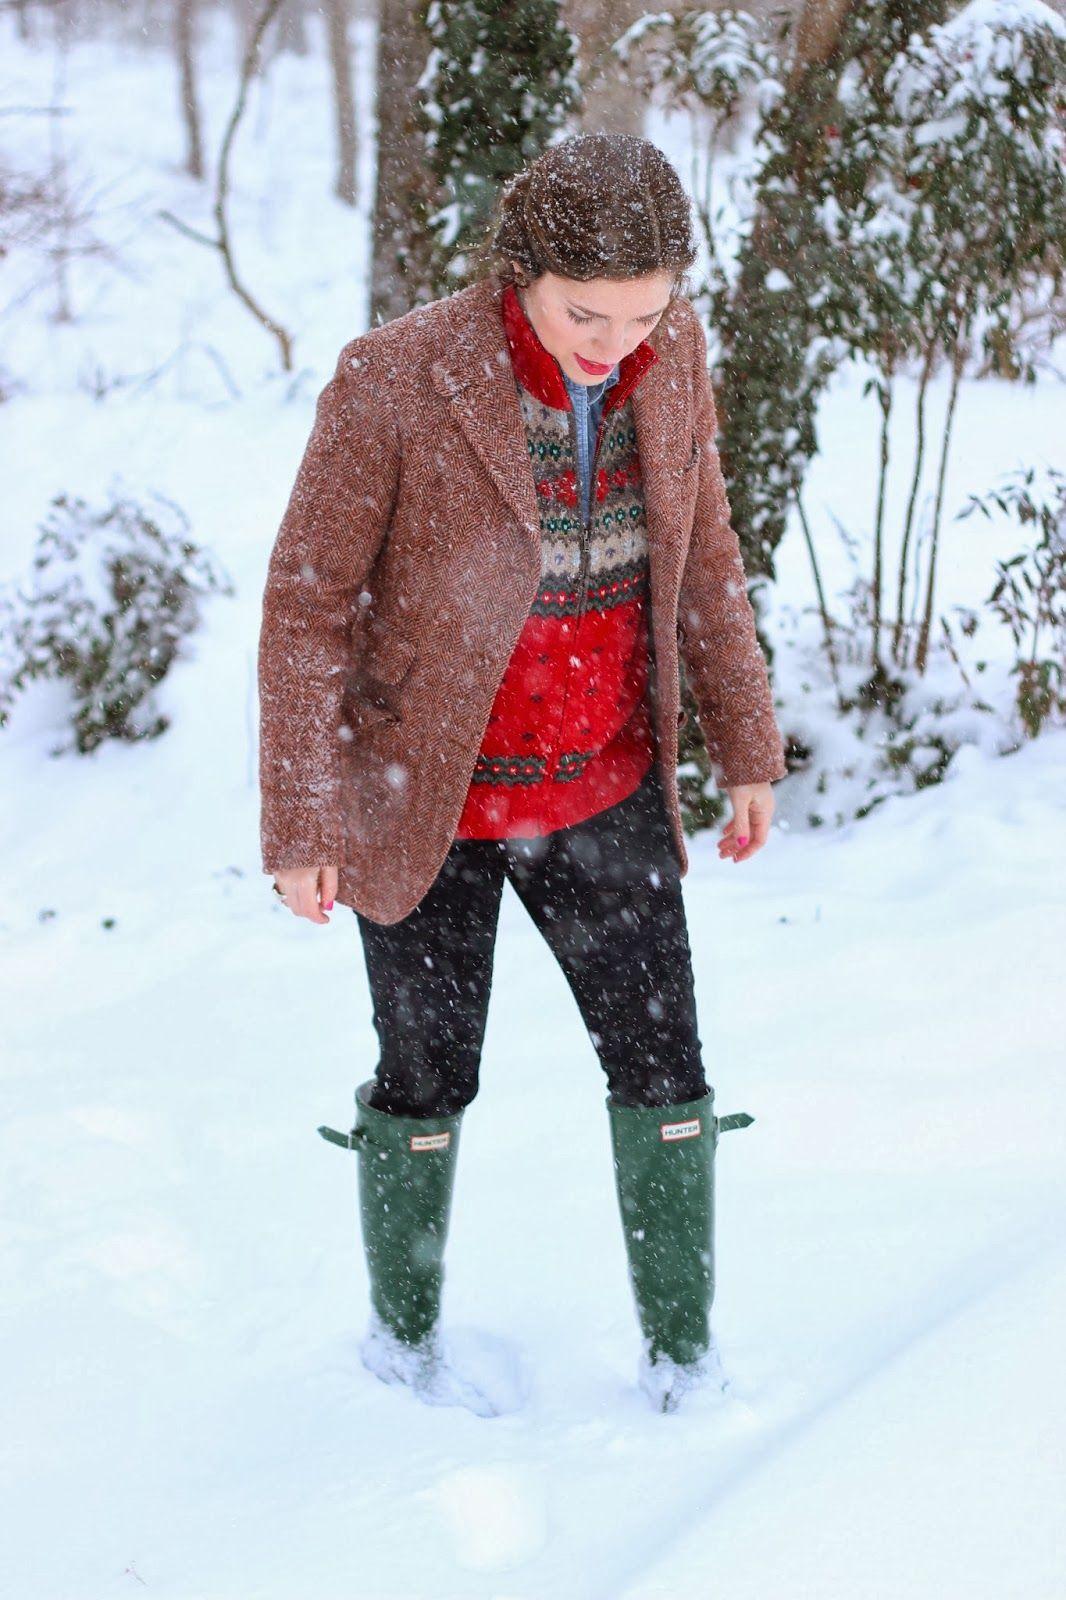 @Ralph Holzmann Lauren sweater, Harris tweed coat, Hunter boots